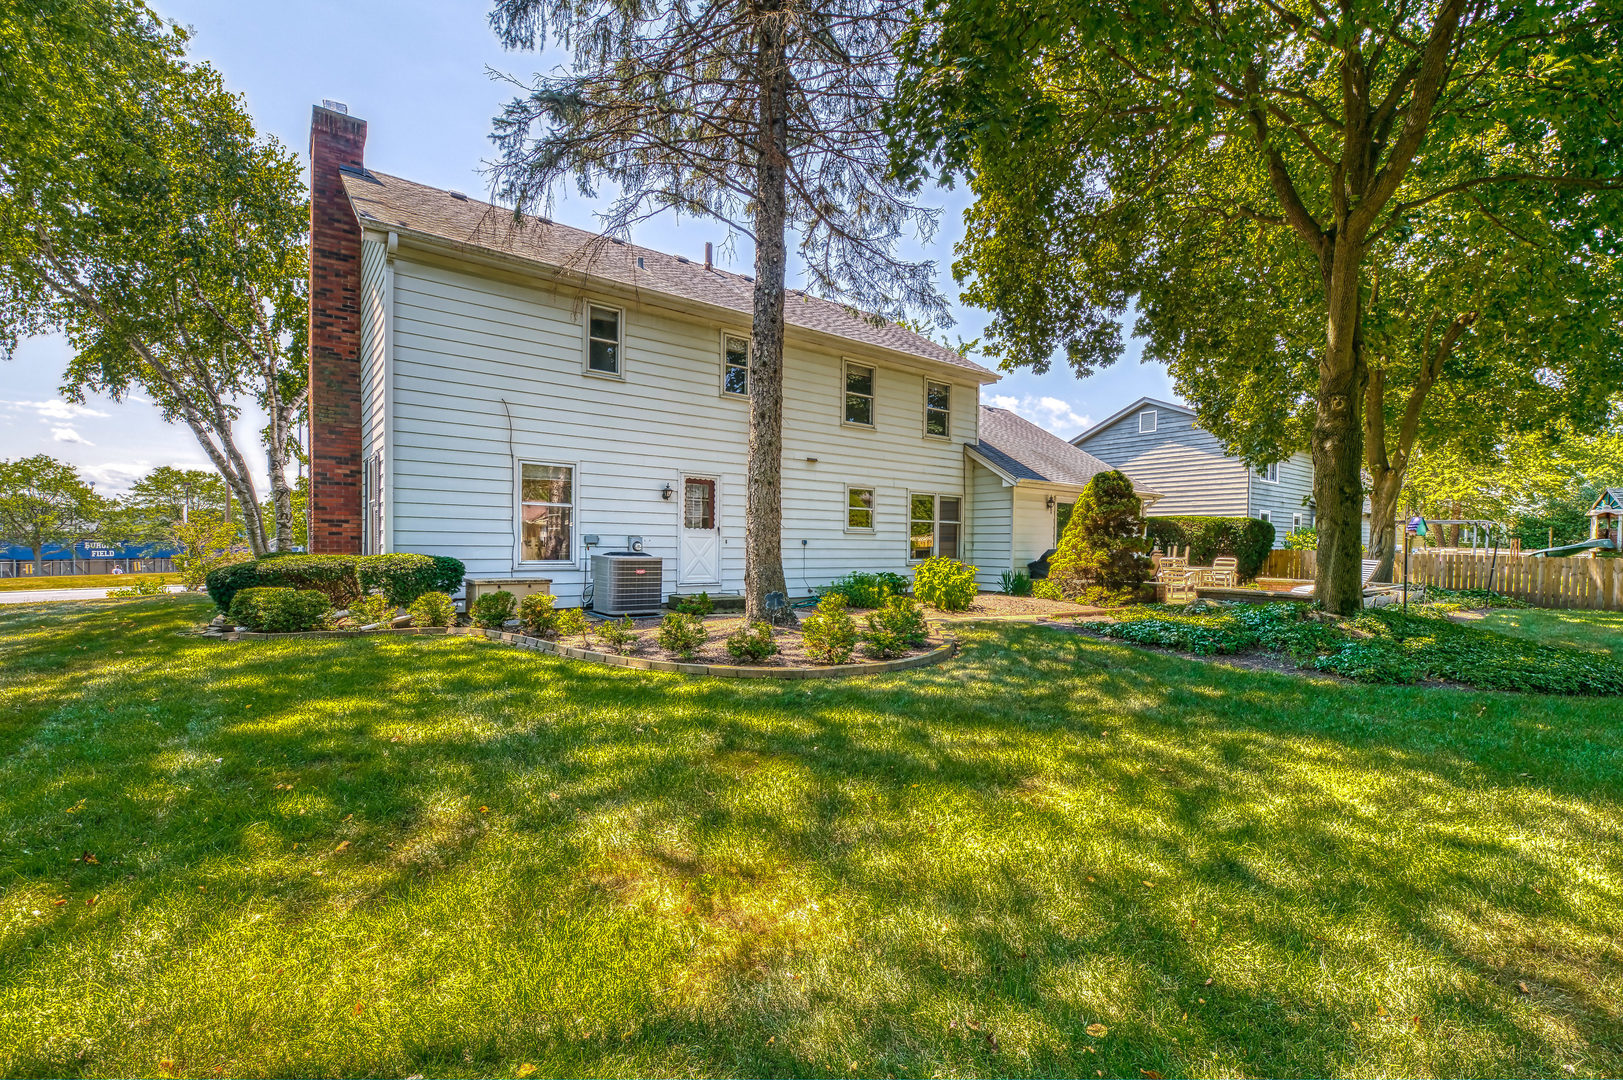 734 Gray, ST. CHARLES, Illinois, 60174